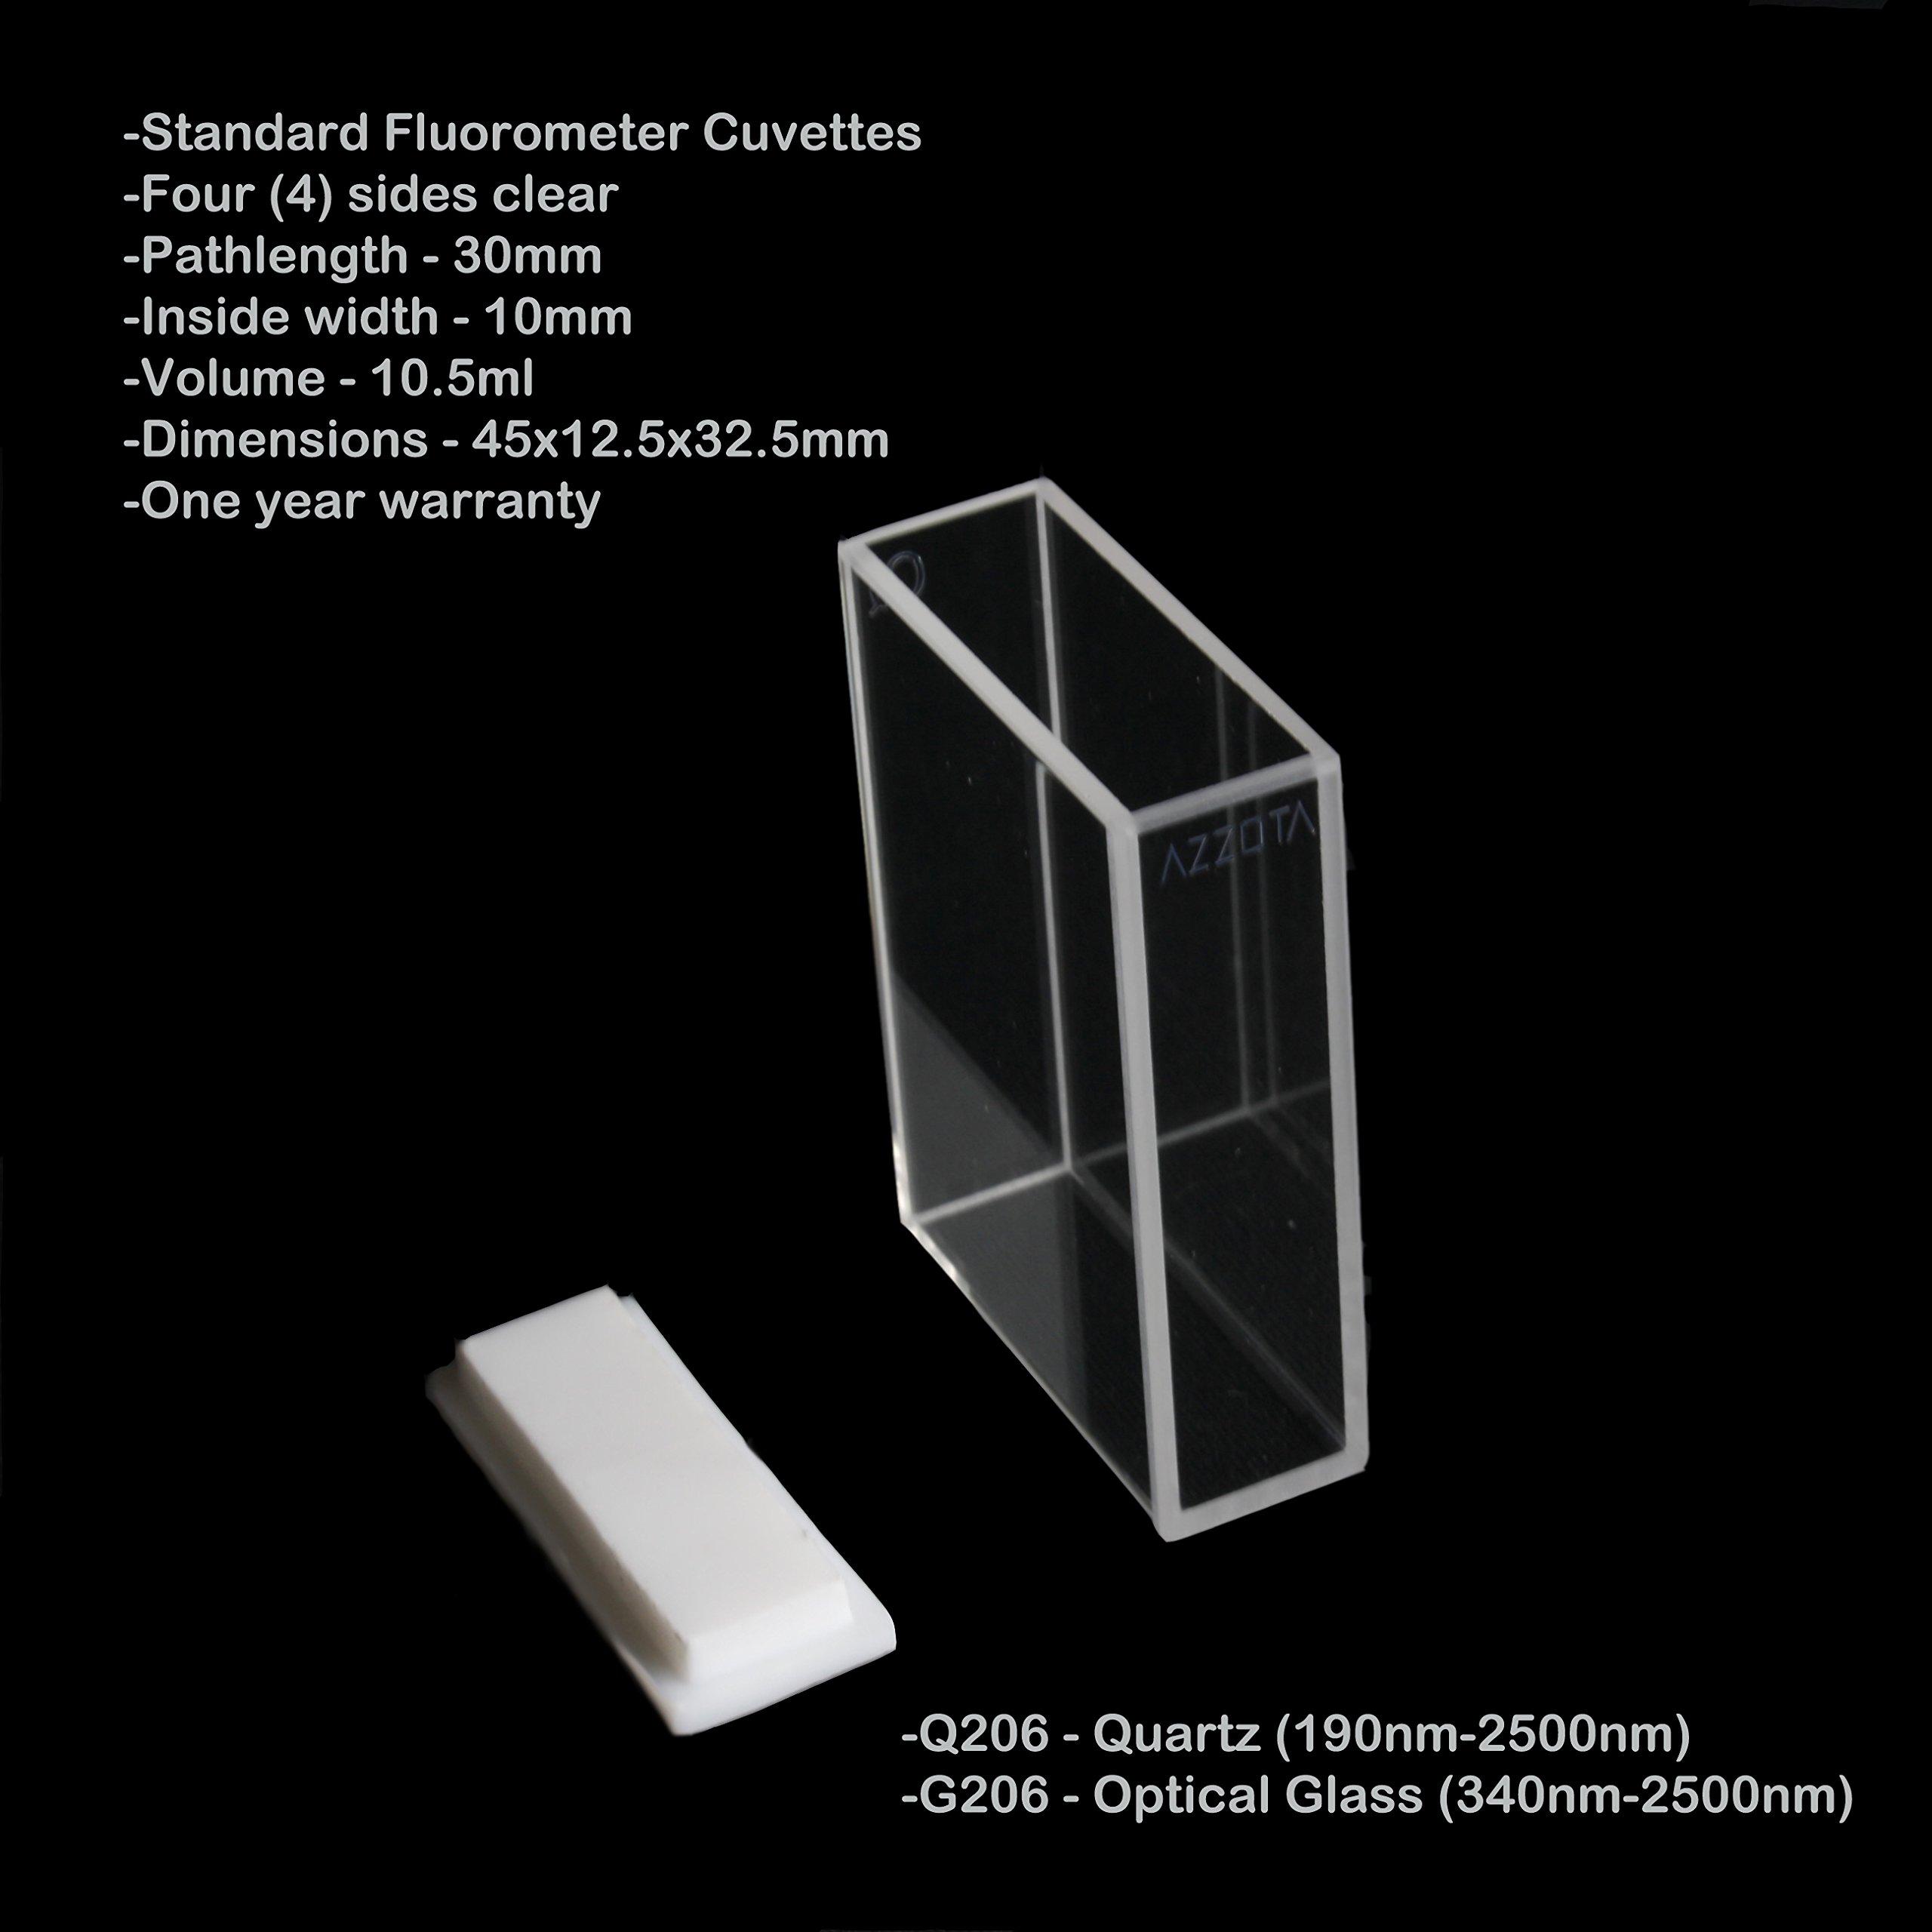 Labomed G206 Standard Fluorimeter Cell with Lid, Glass, 30mm Path Length, 10.5mL Volume